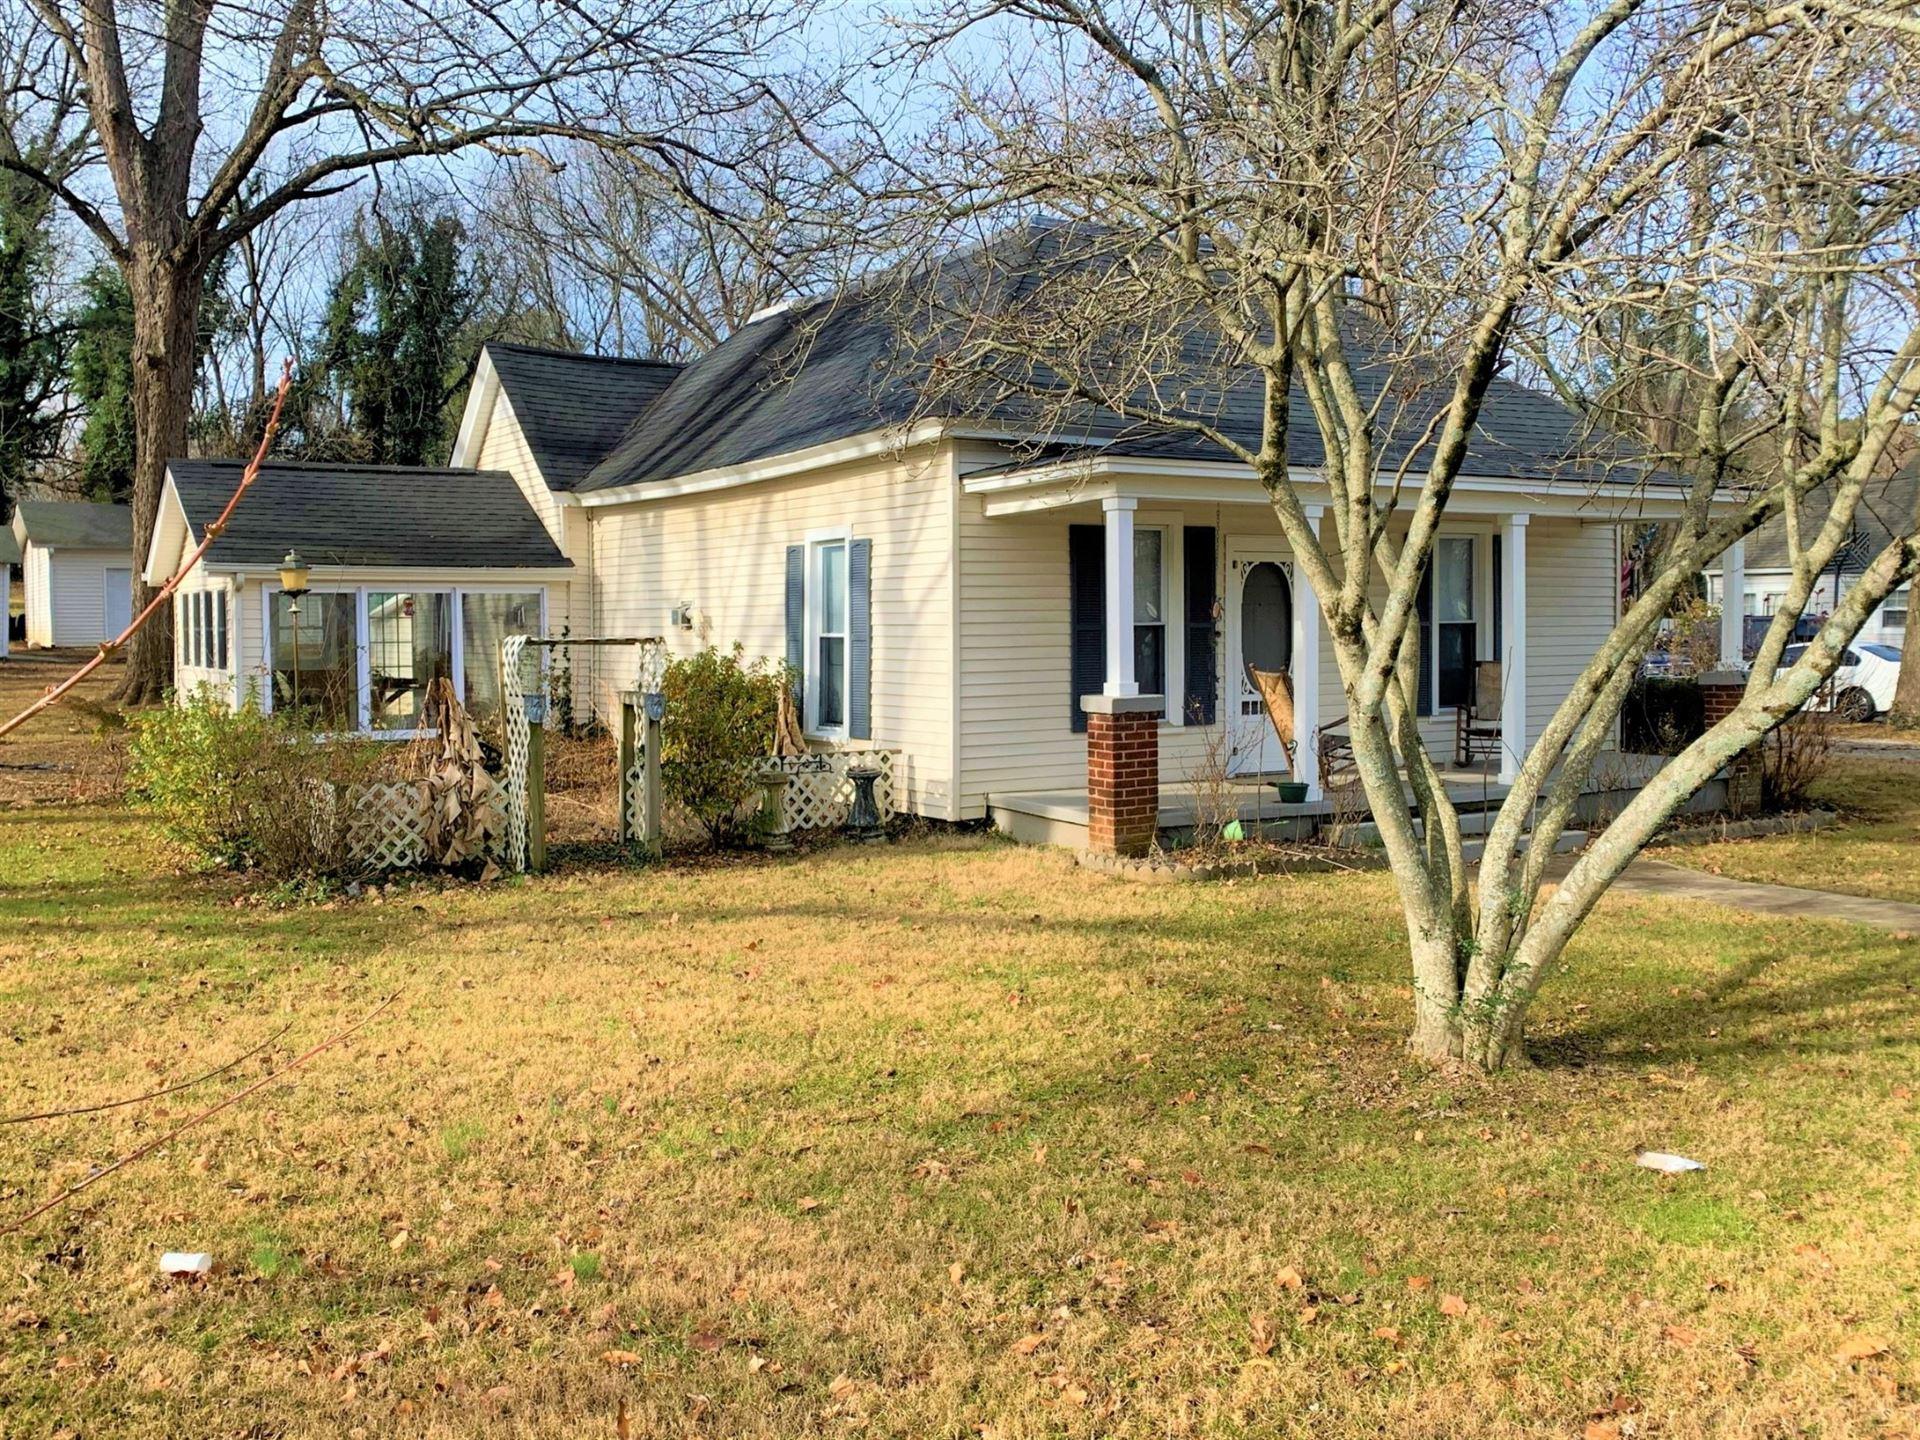 805 N High St, Winchester, TN 37398 - MLS#: 2218512